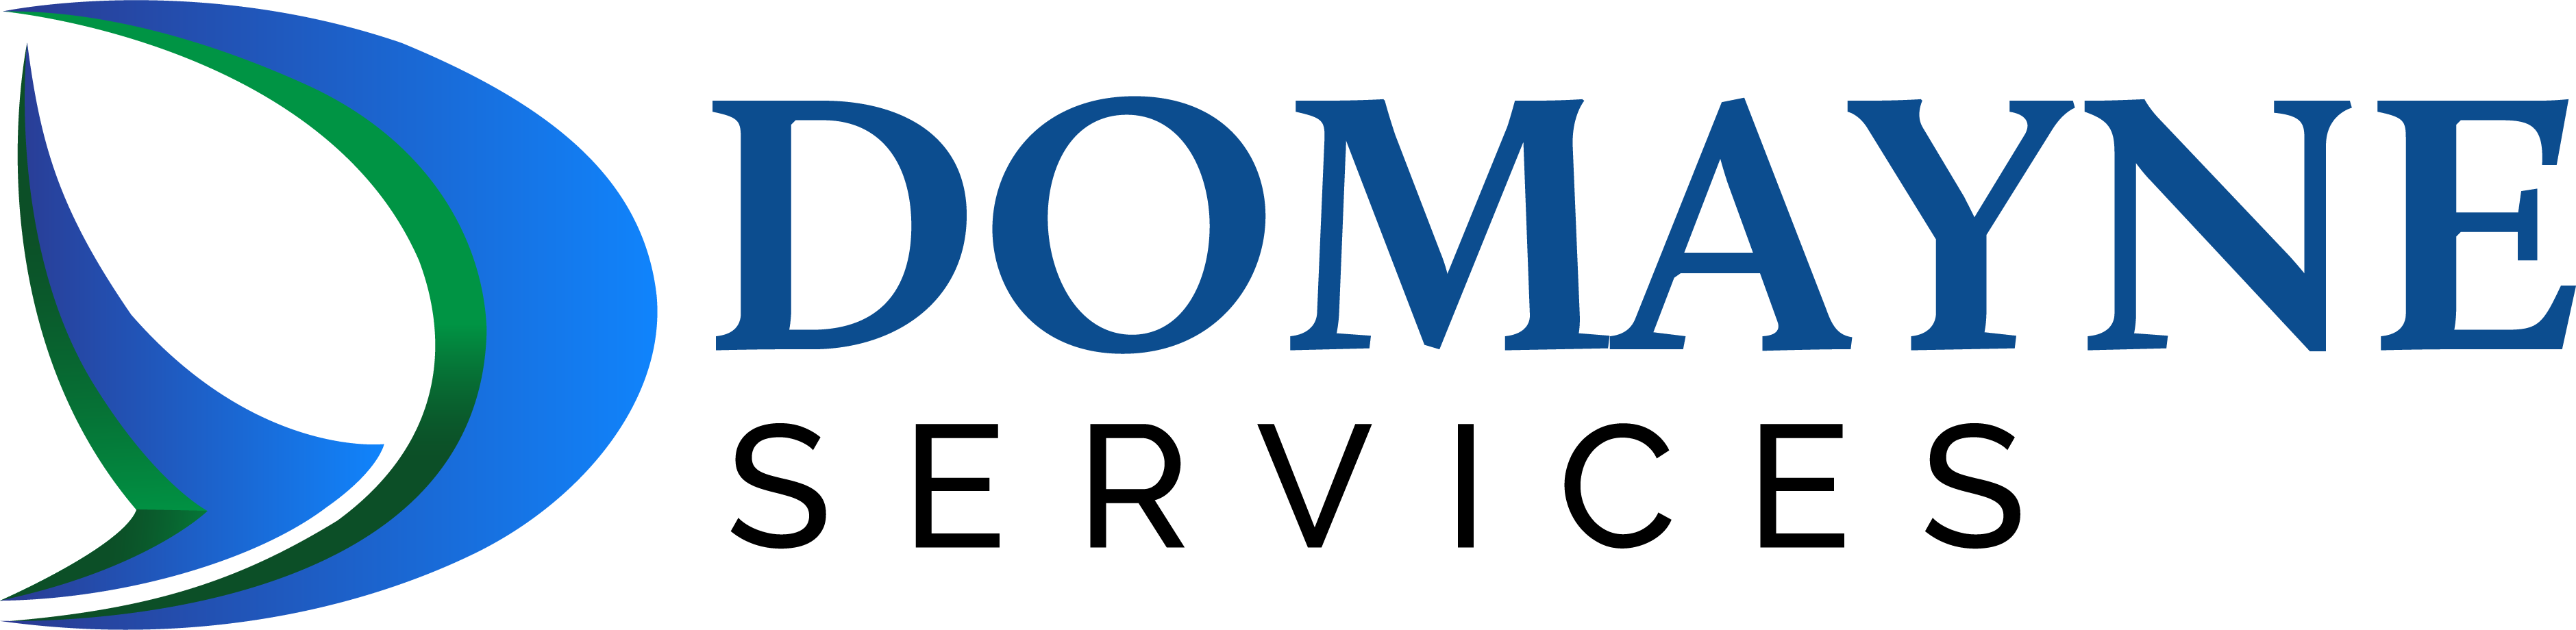 Domayne Services Logo